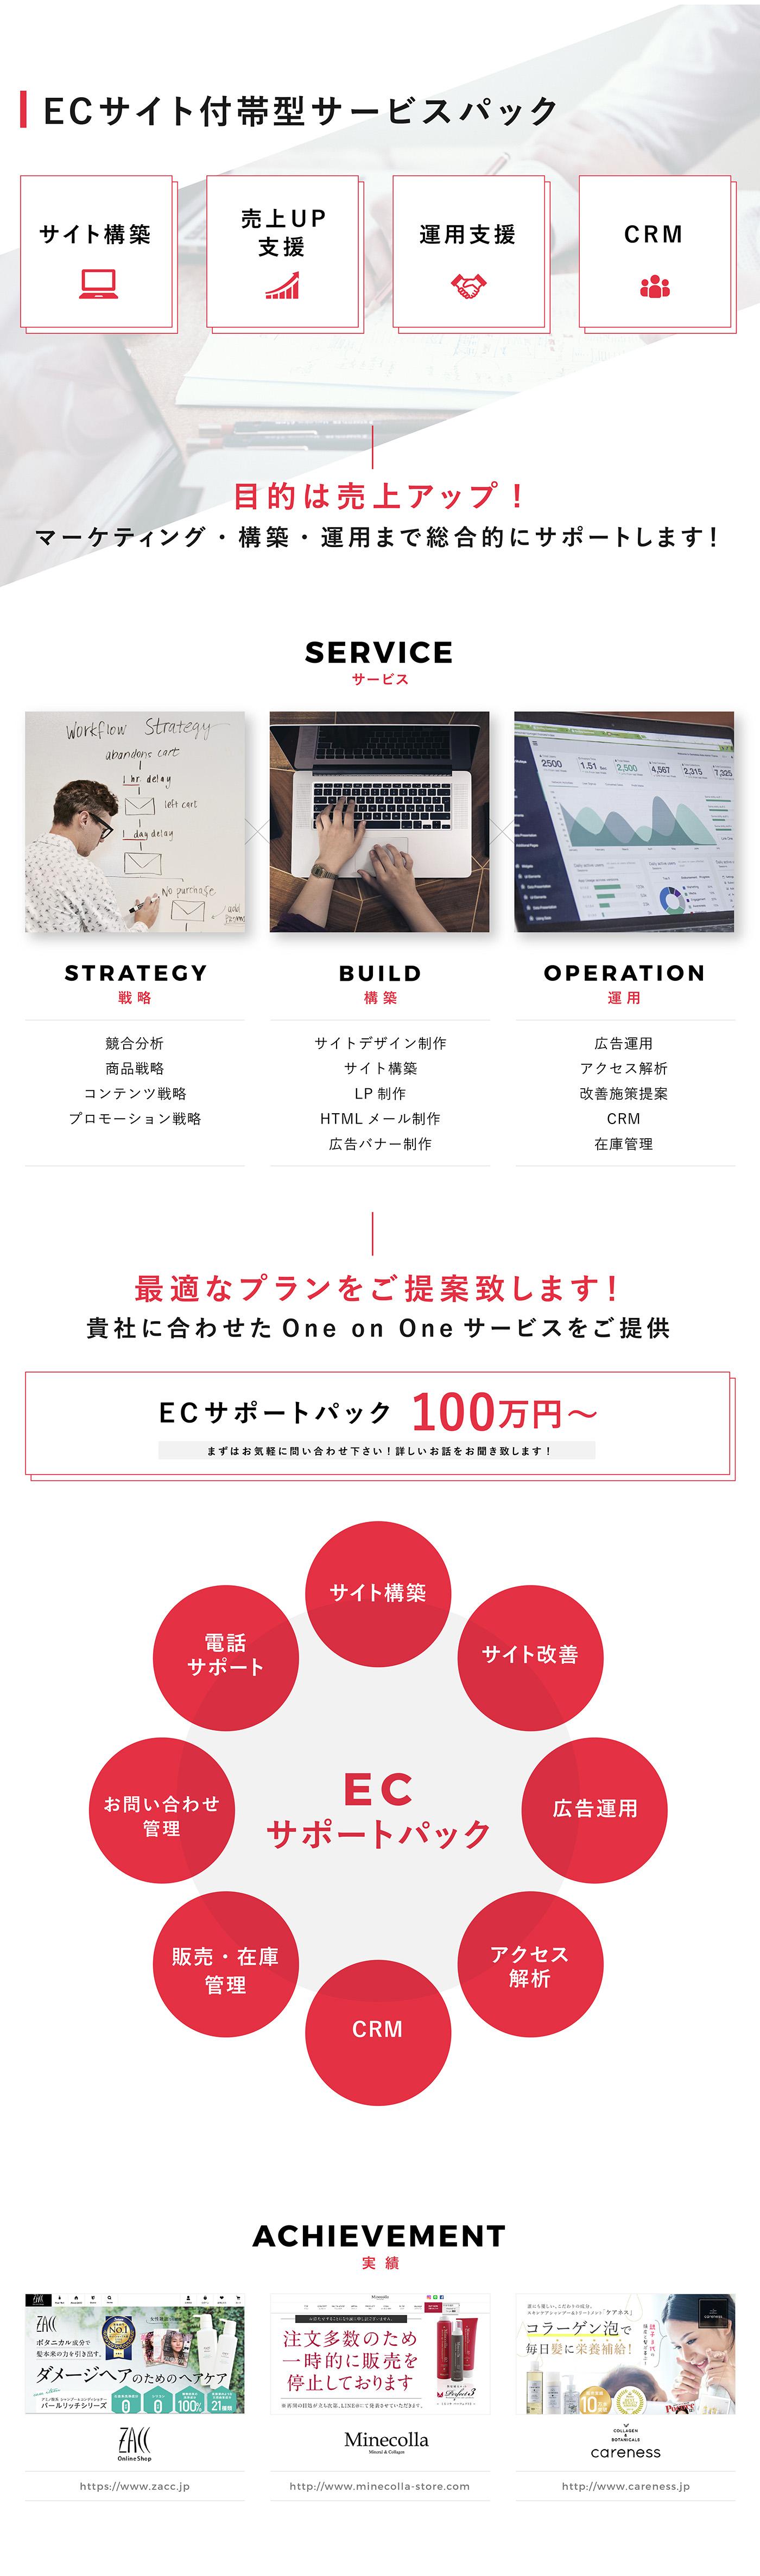 ECサイト付帯型サービスパック